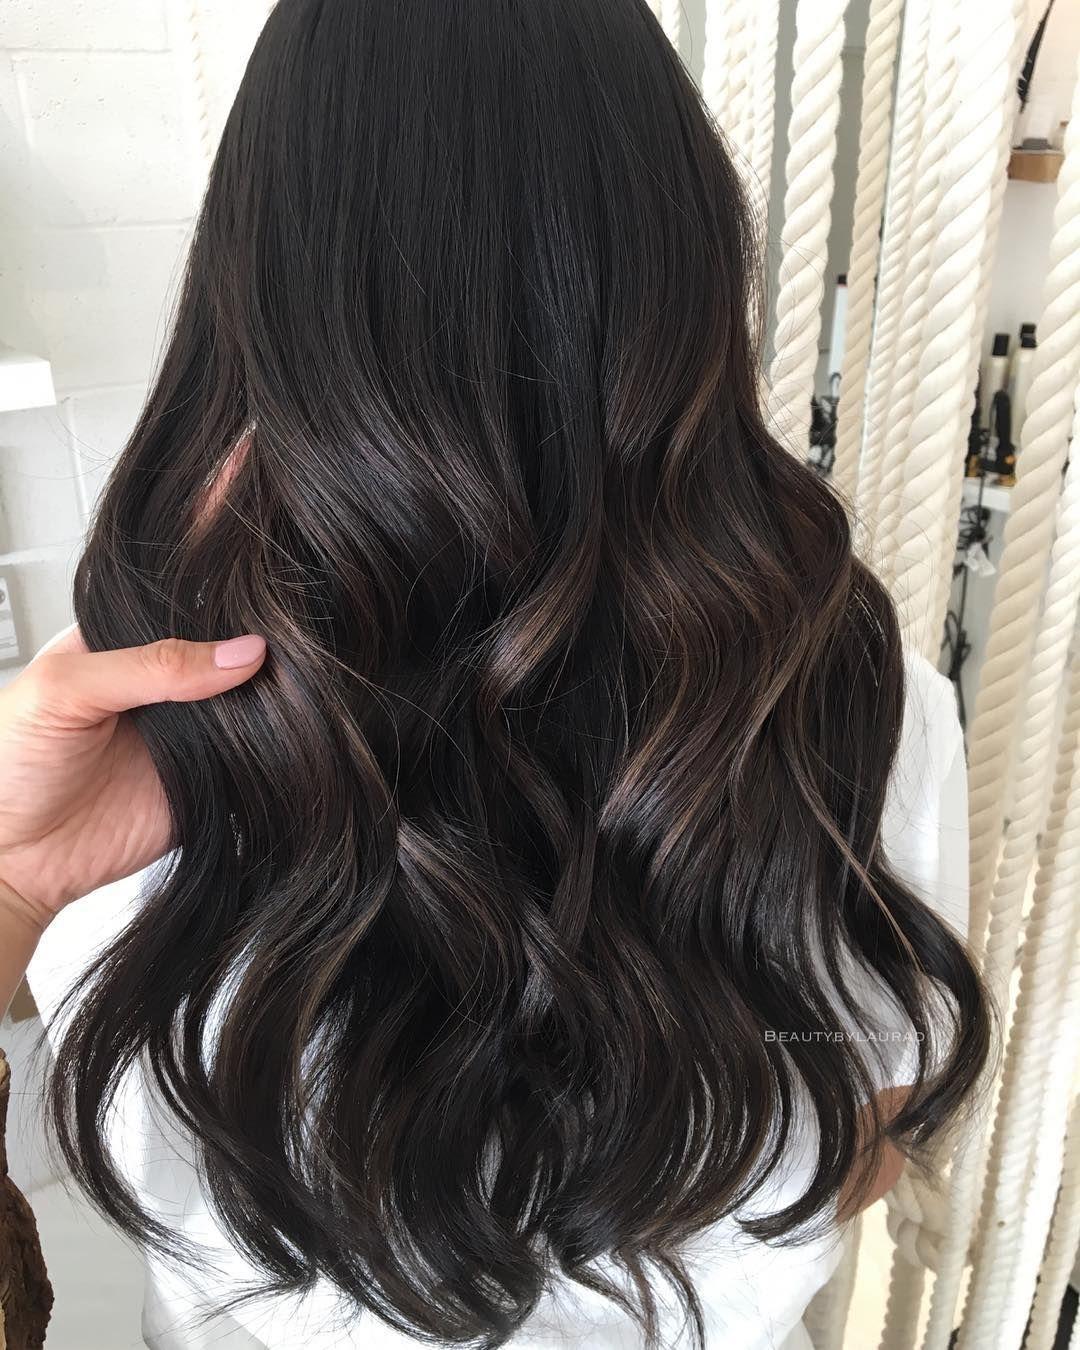 Instagram Insta Und Pinterest Amy Blondehairstyles Darkhairstyles Diyhairstylesshorthair Haircu In 2020 Hair Styles Hair Color For Black Hair Balayage Hair